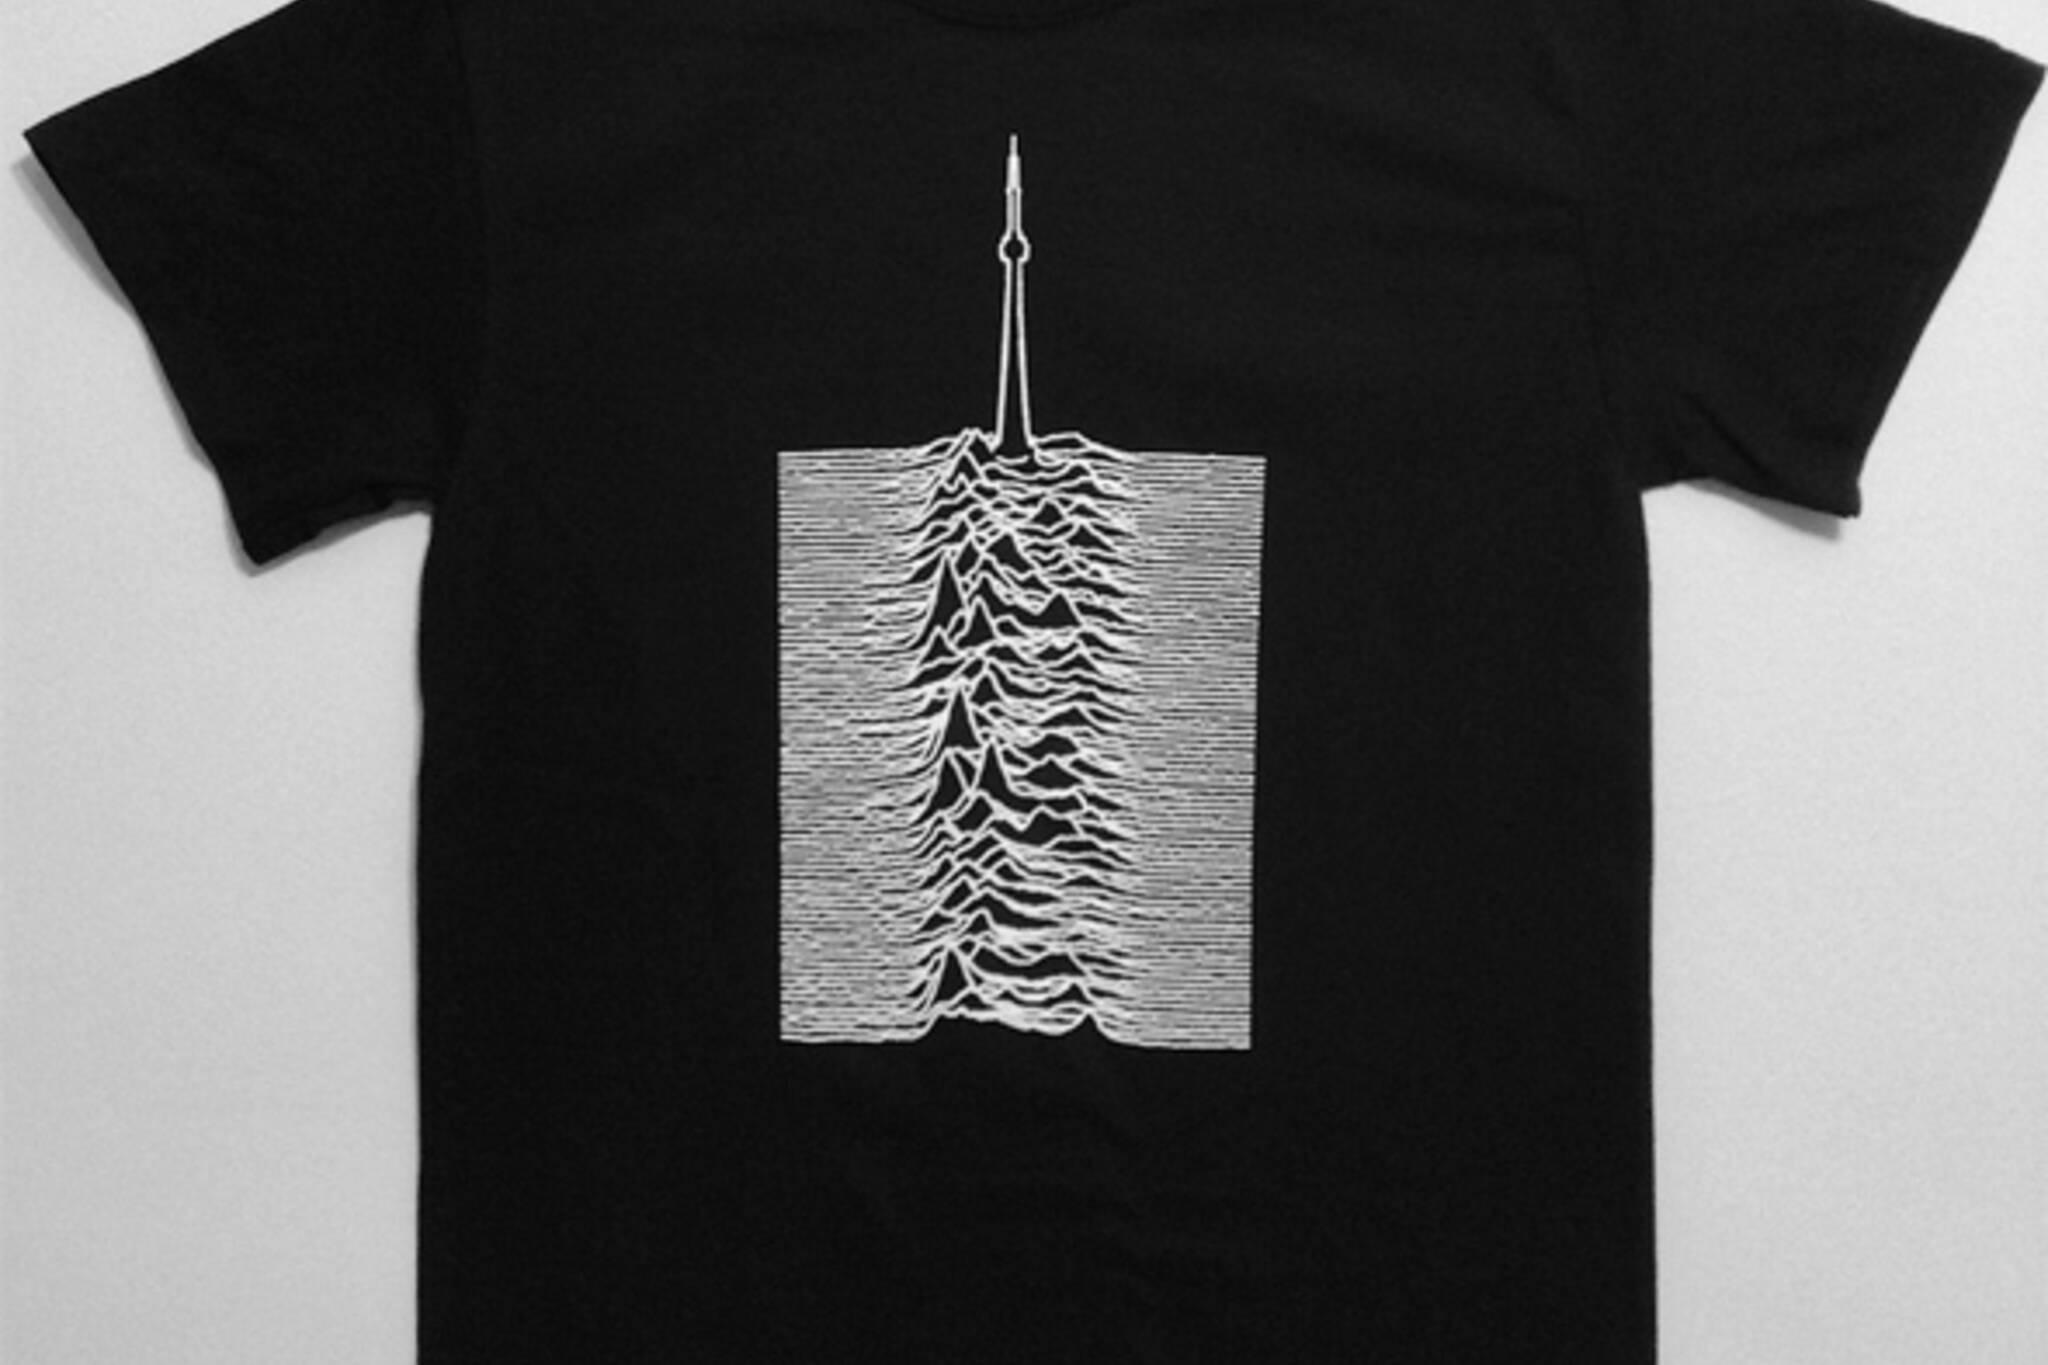 joy division cn tower shirt